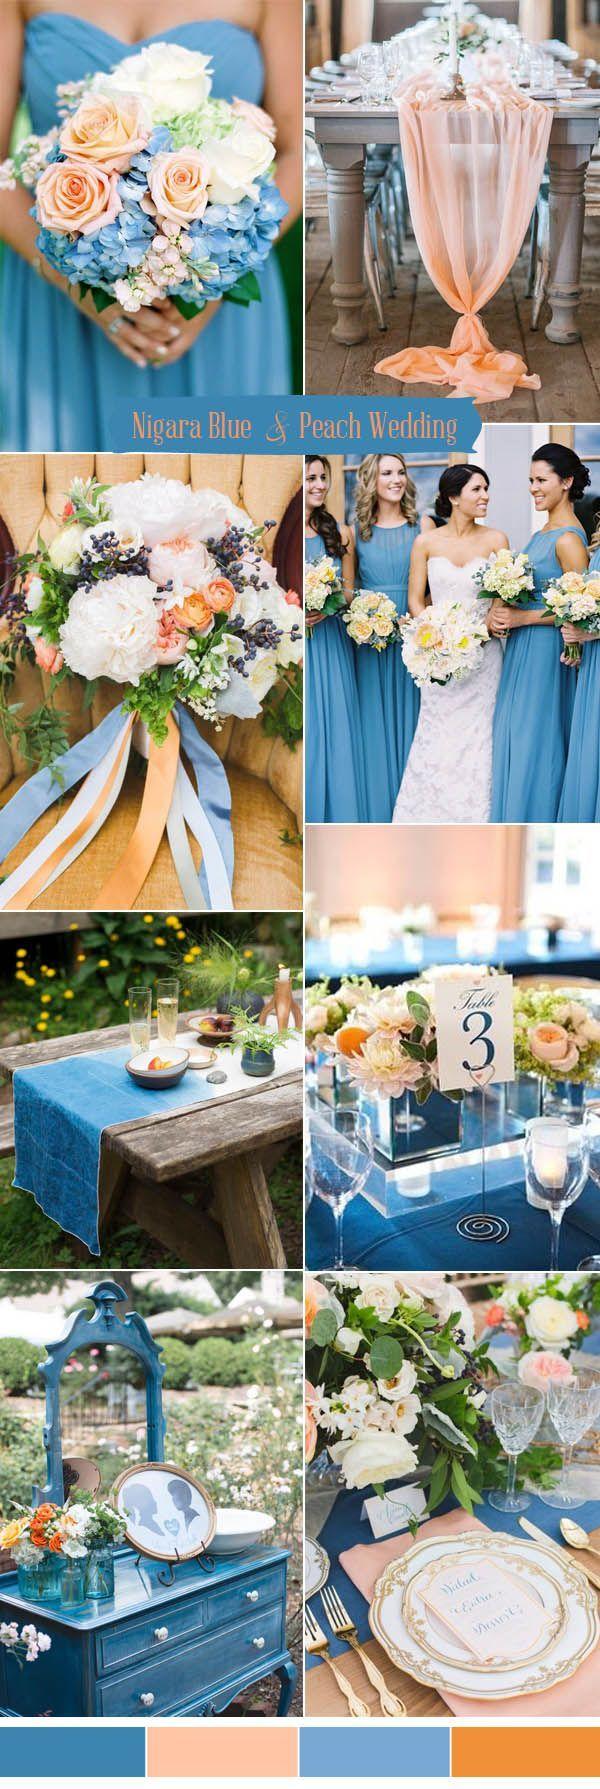 pantone color nigara blue and peach wedding color ideas for 2017 trends